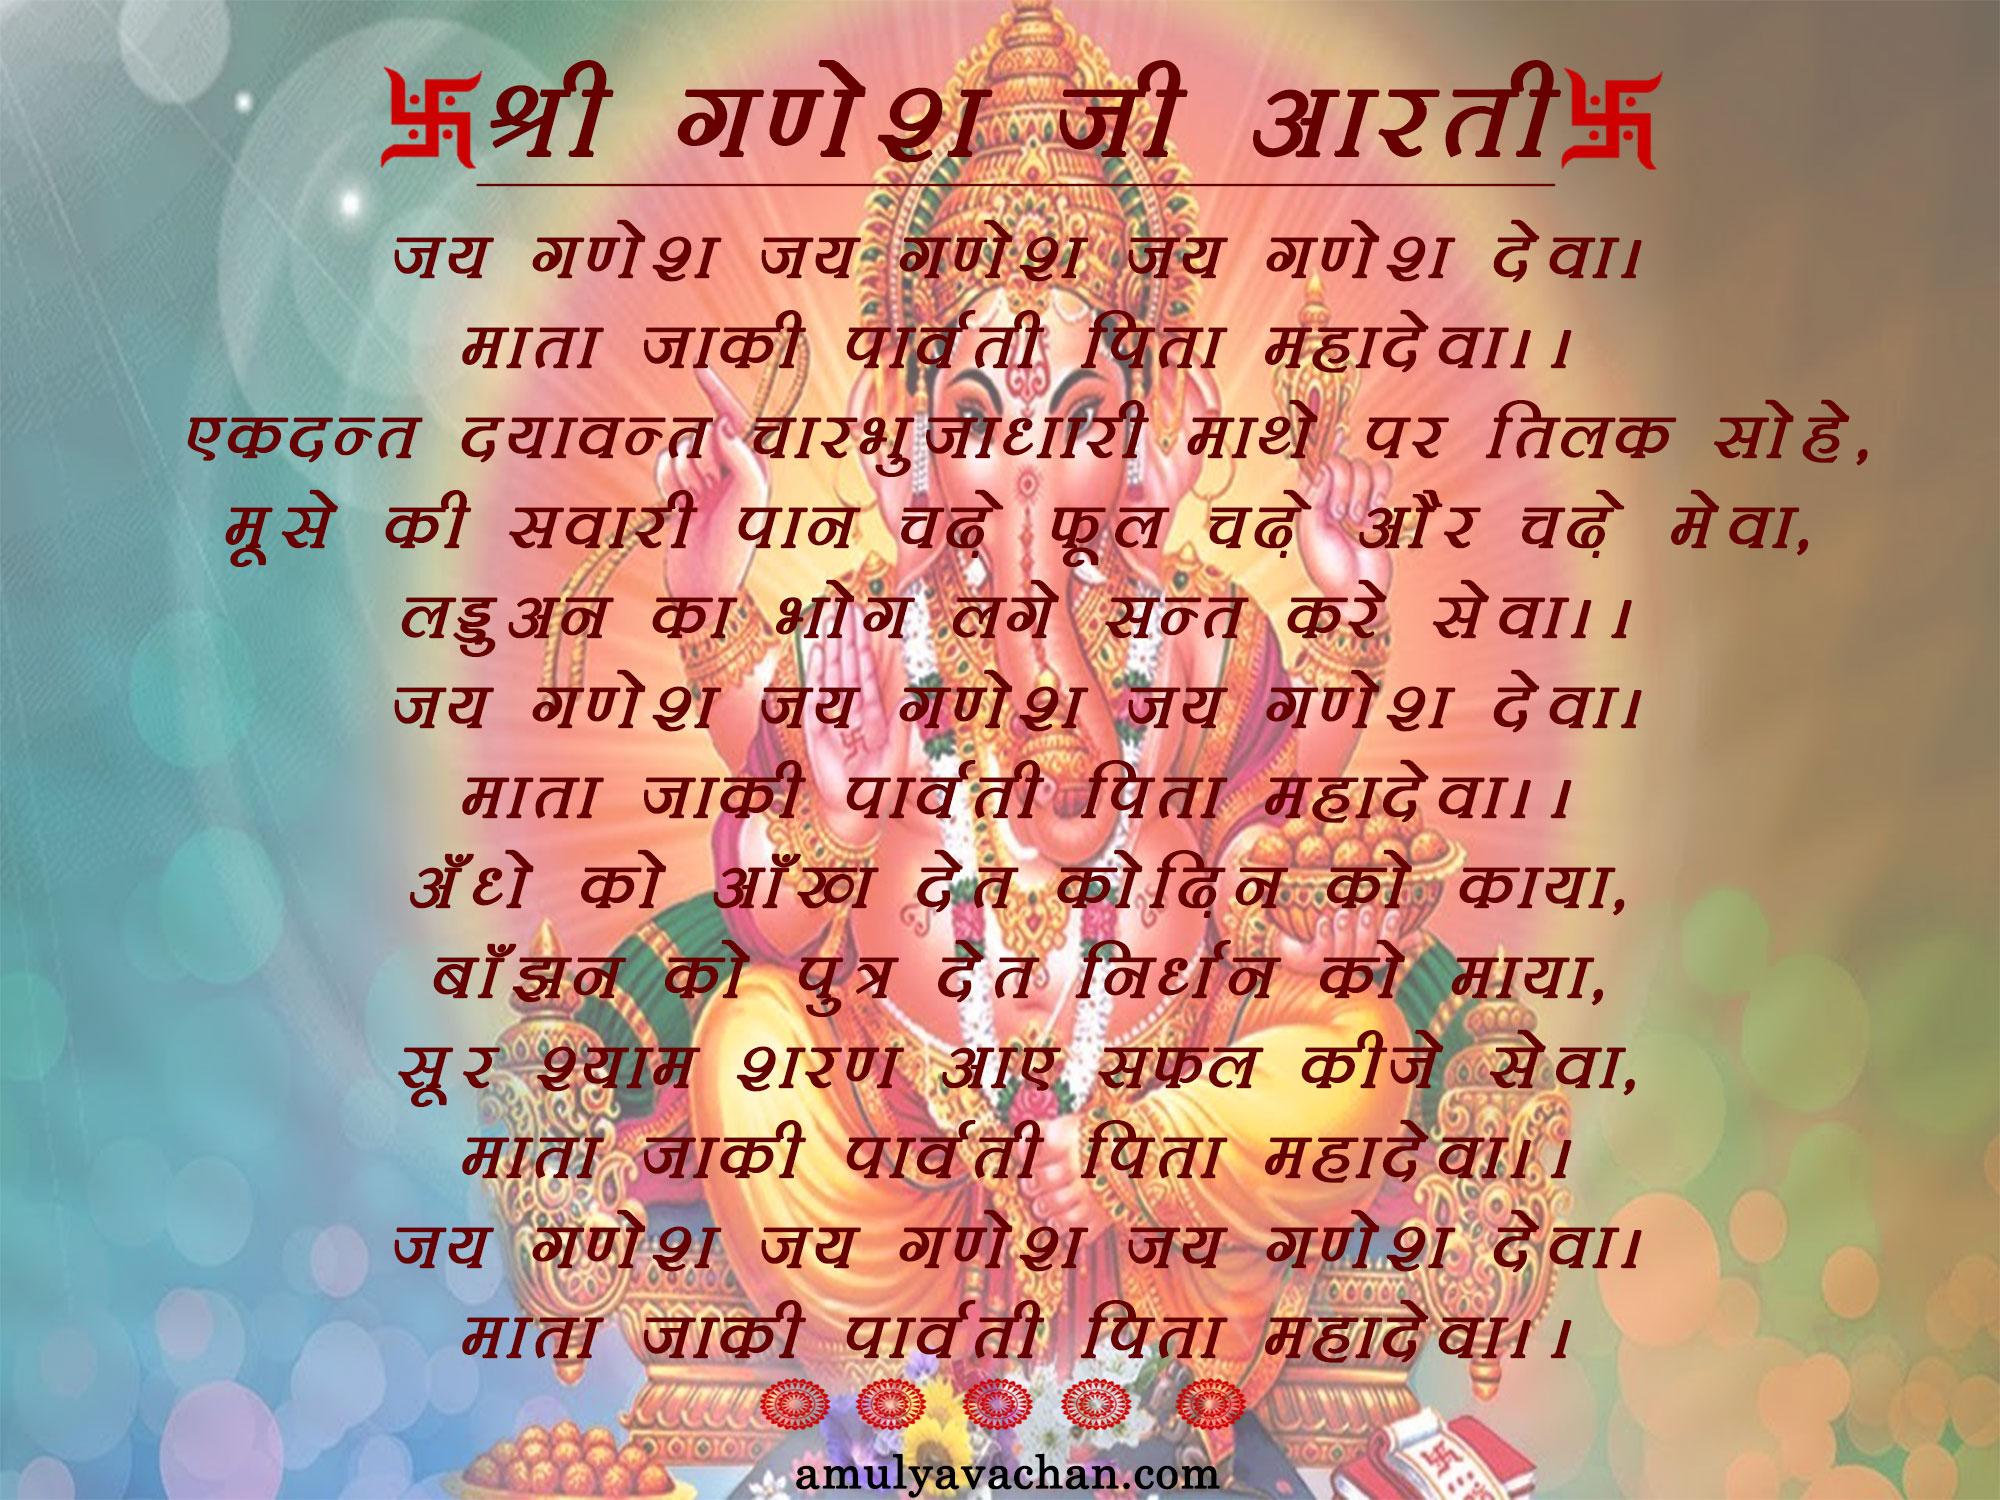 Shri Ganesh Aarti